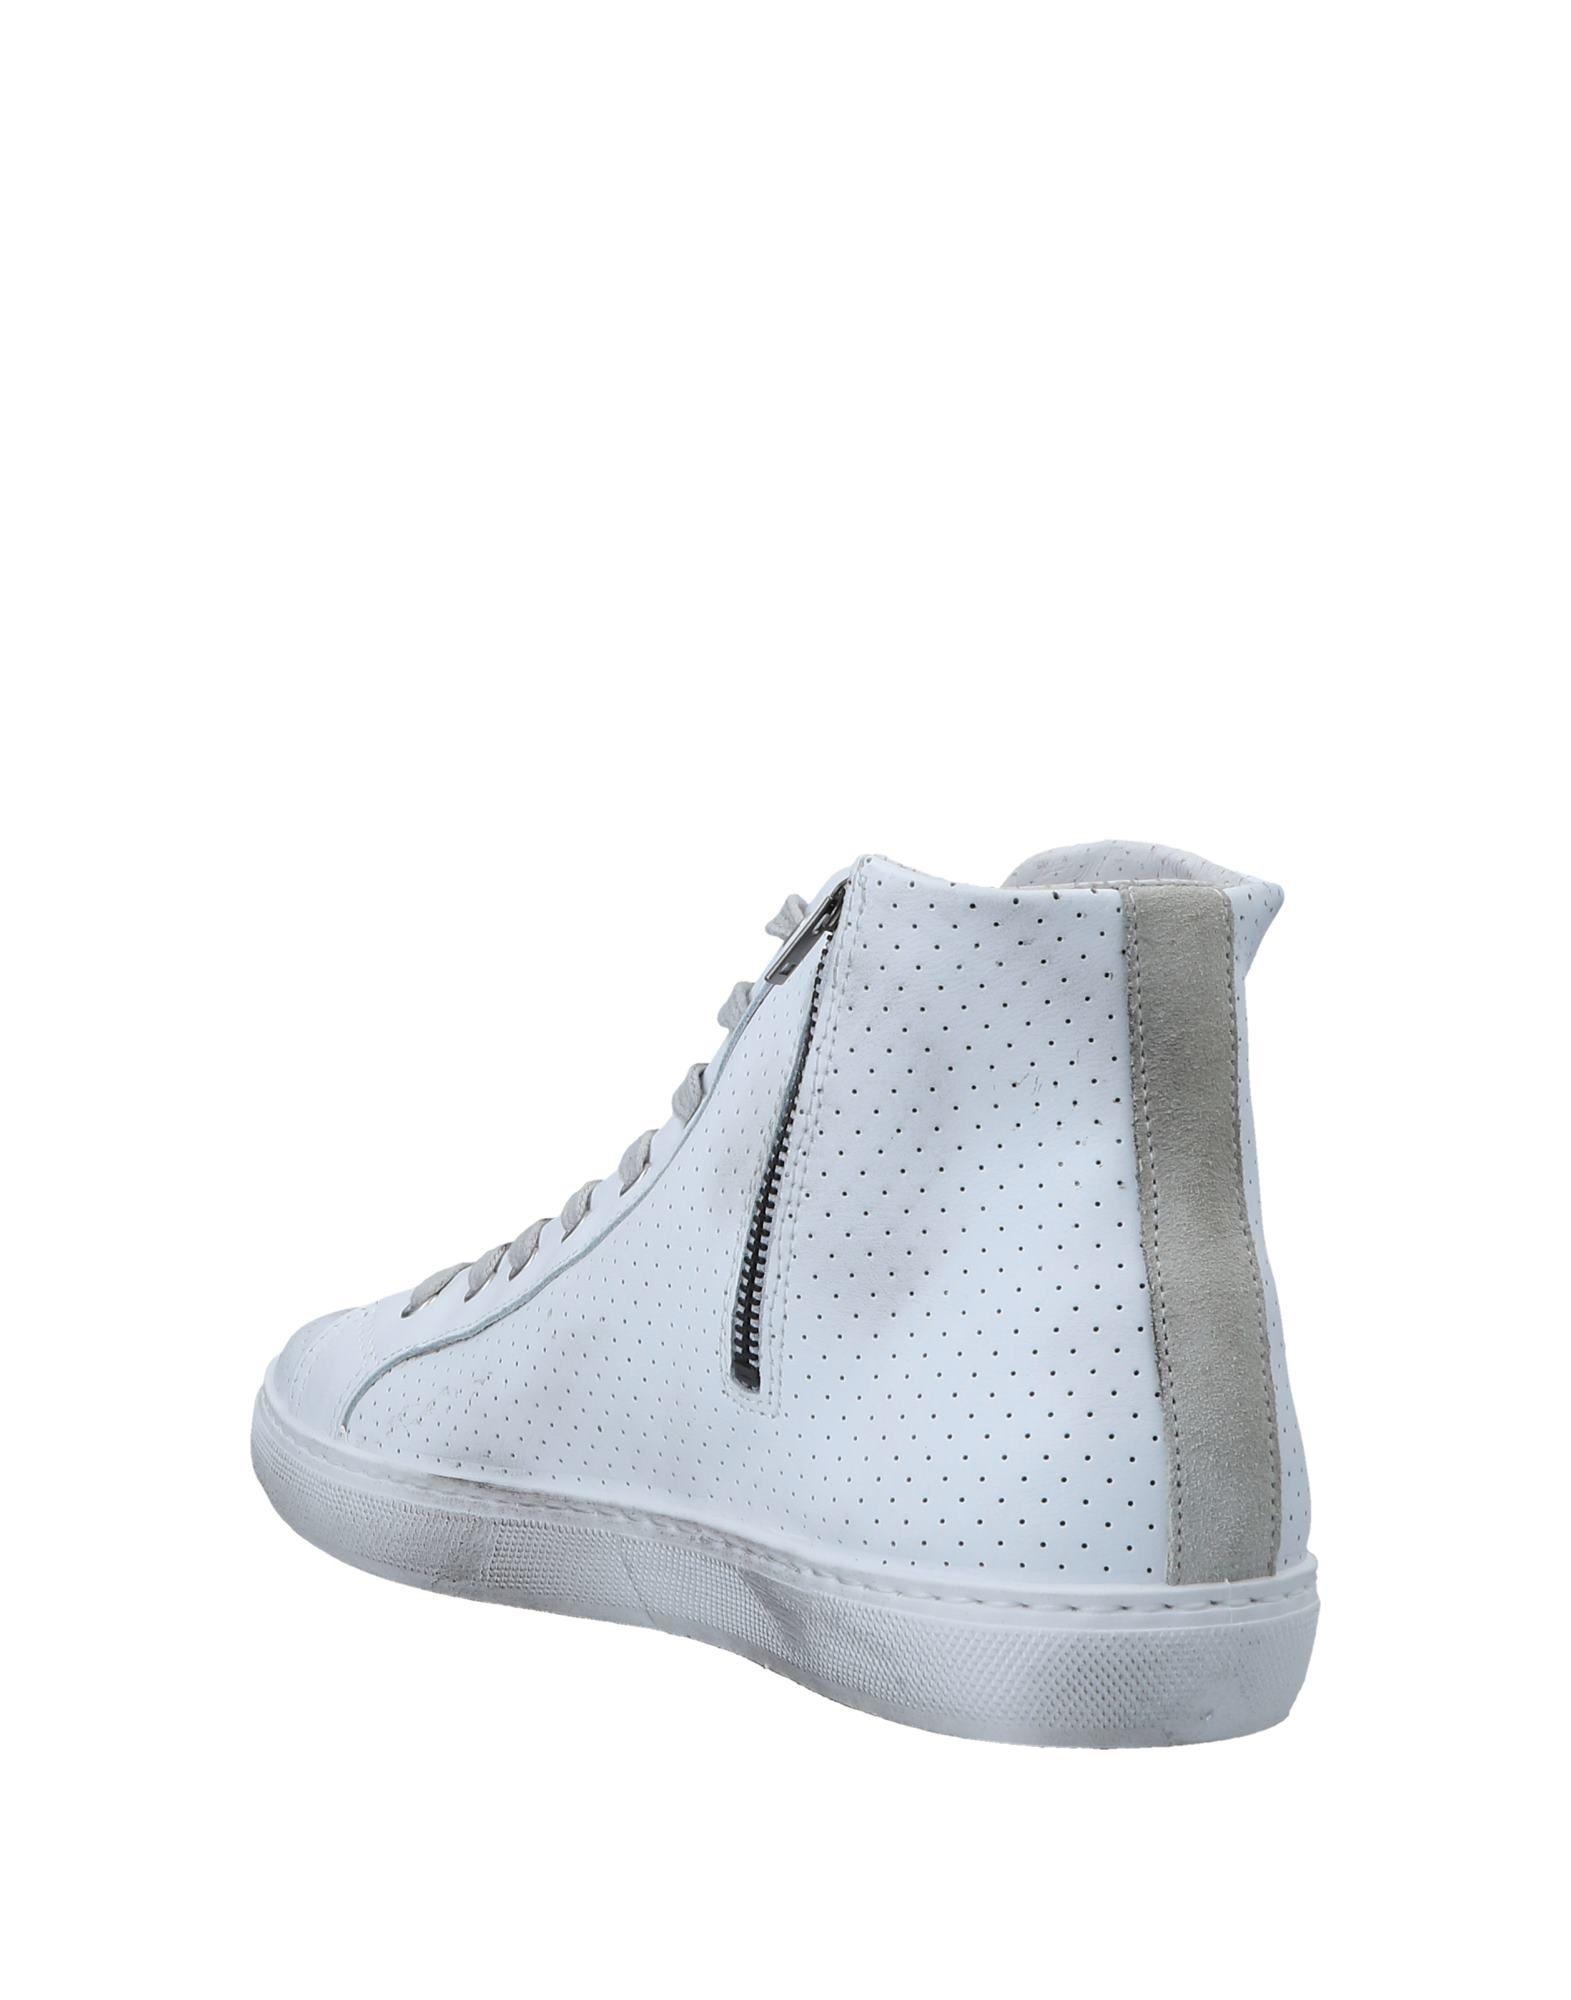 2Star Sneakers - Men 2Star Sneakers online on  Australia Australia Australia - 11555162DF 7fa760